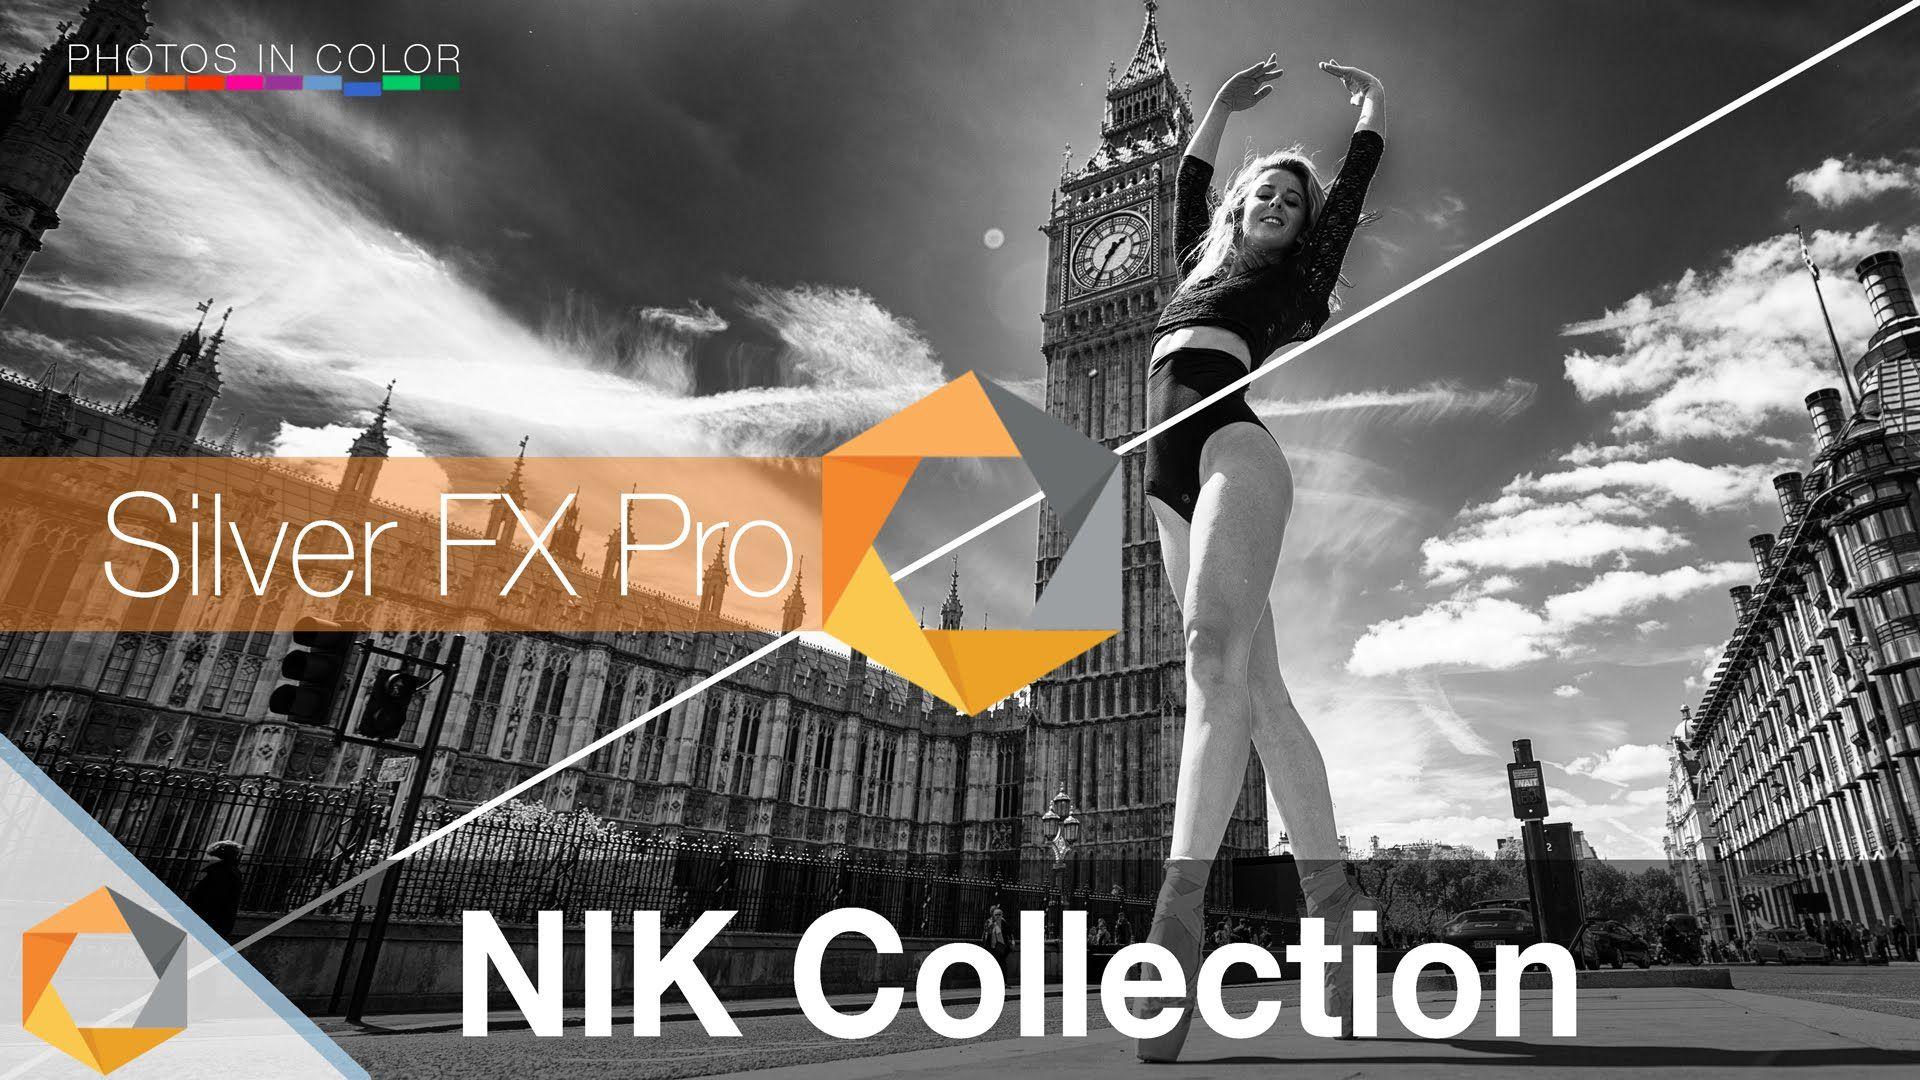 Nik Collection Tutorial - Part 7 - Silver FX Pro Photoshop ...